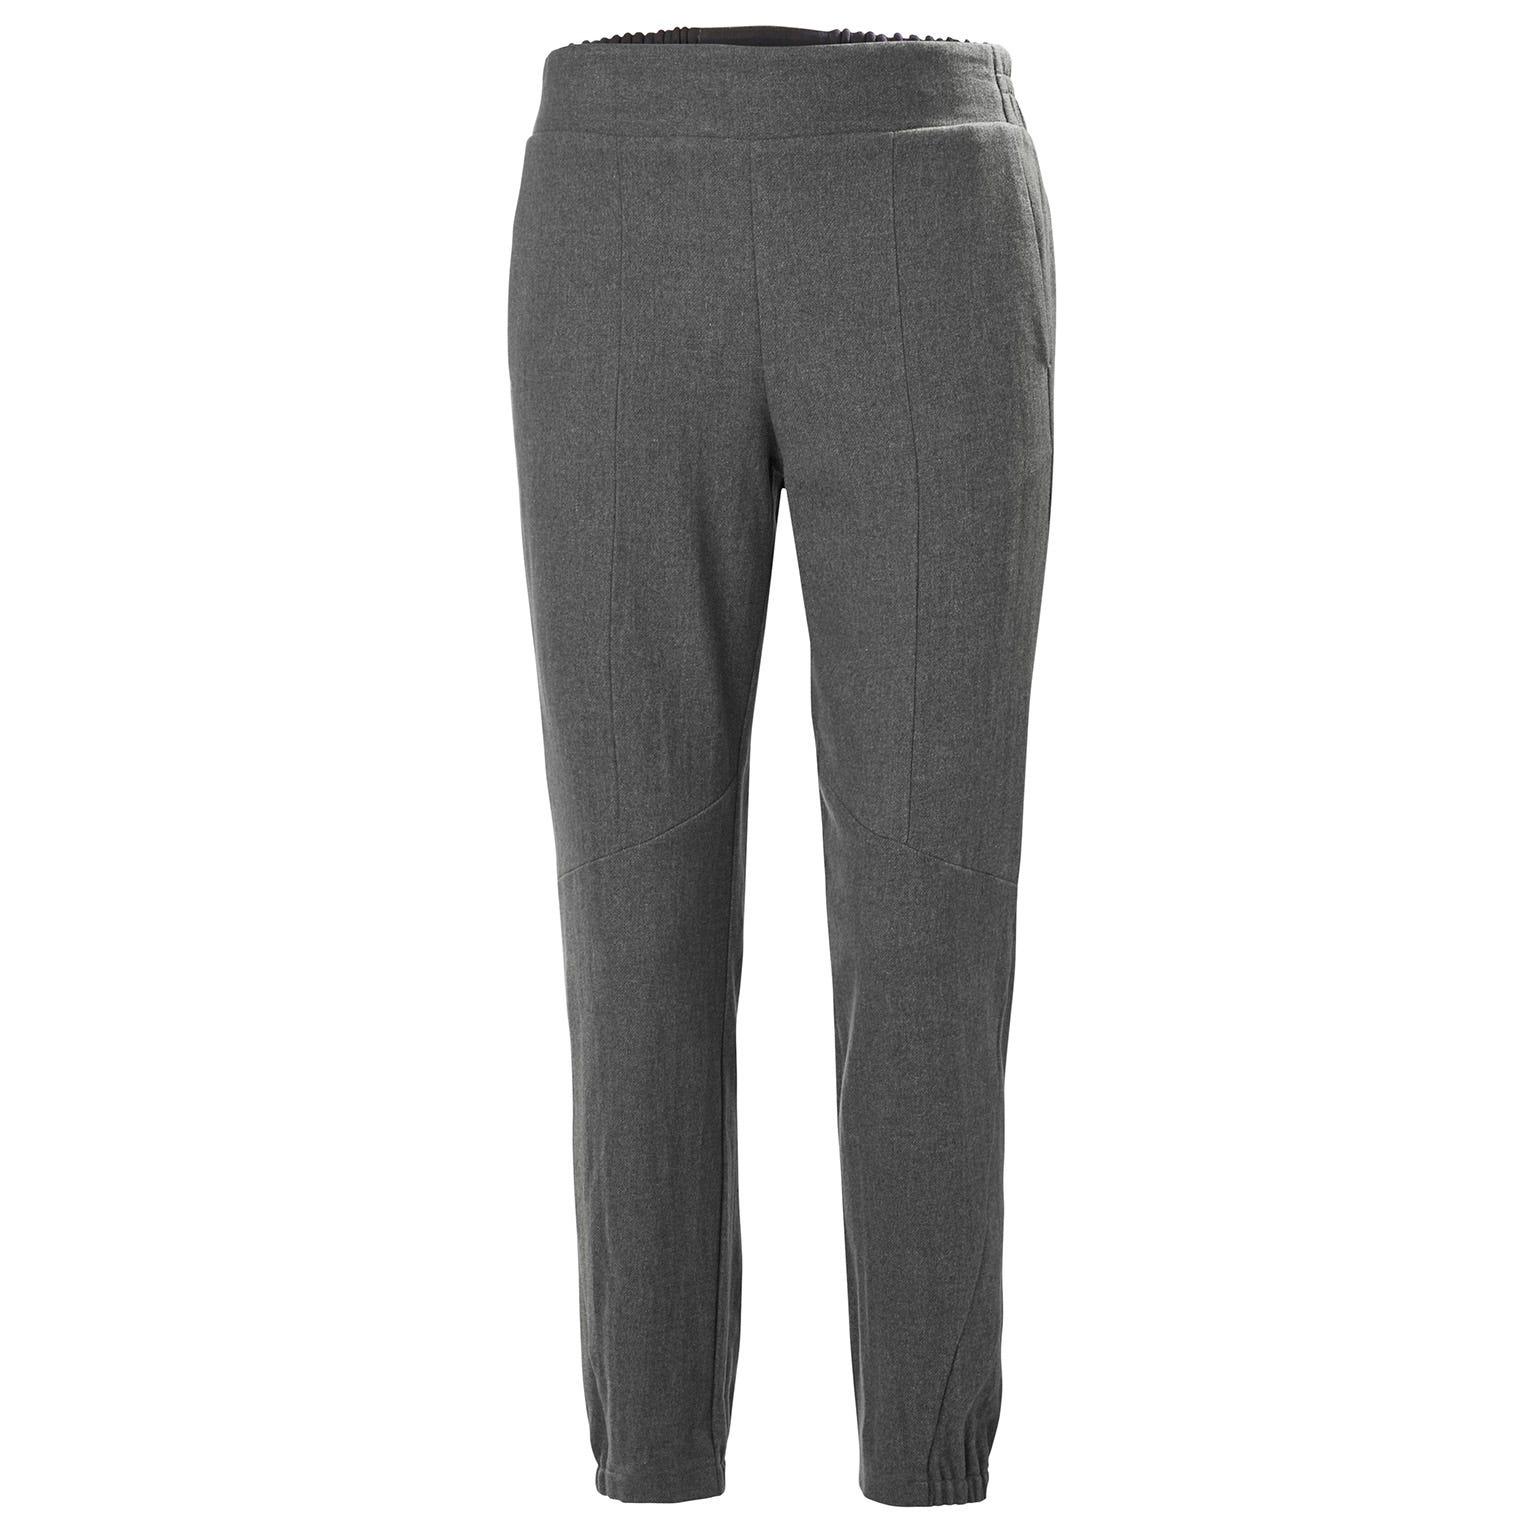 Helly Hansen W Wool Travel Pant Womens Hiking Grey L